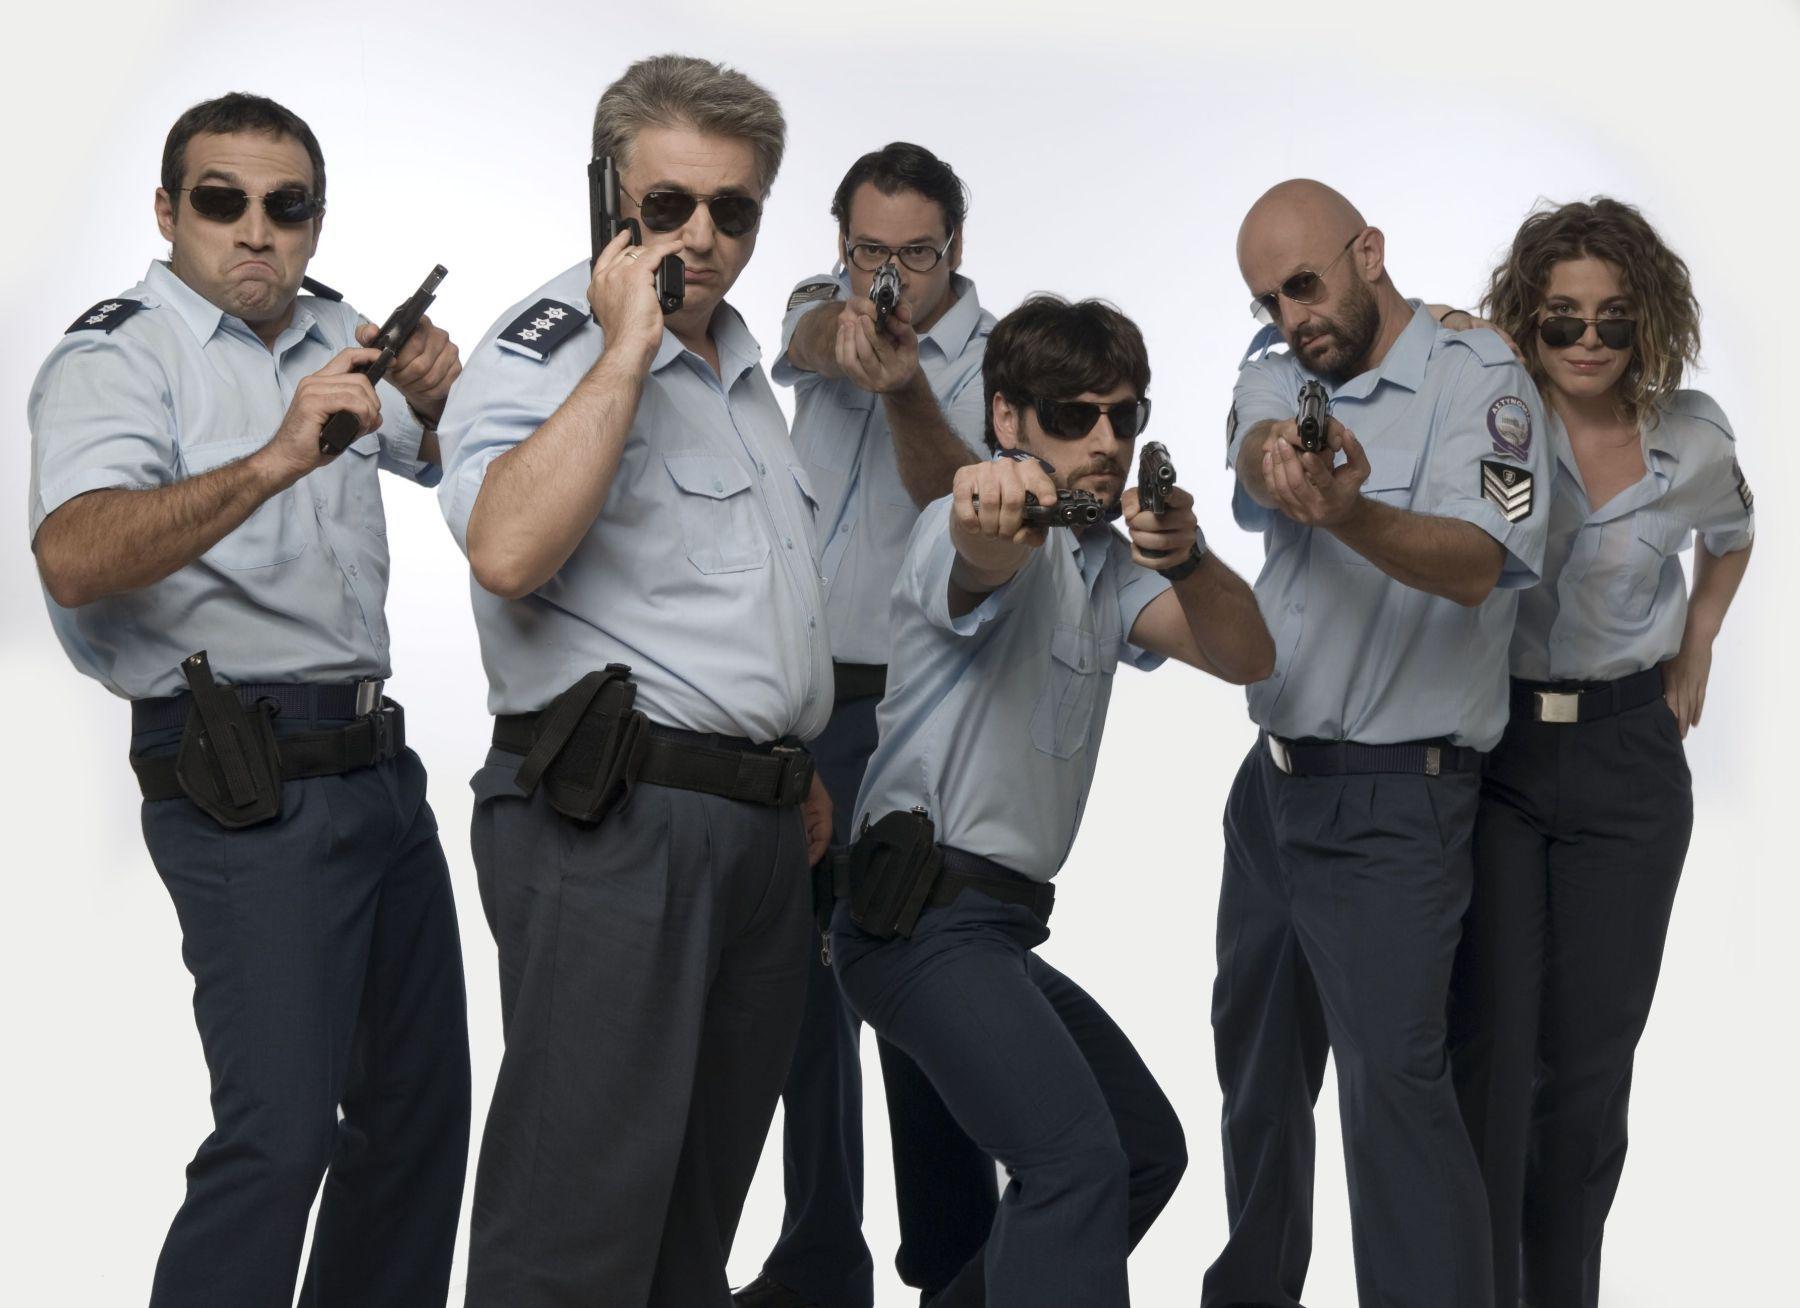 LAPD - Επεισόδια: Δείτε όλα σε Βίντεο και Περιλήψεις